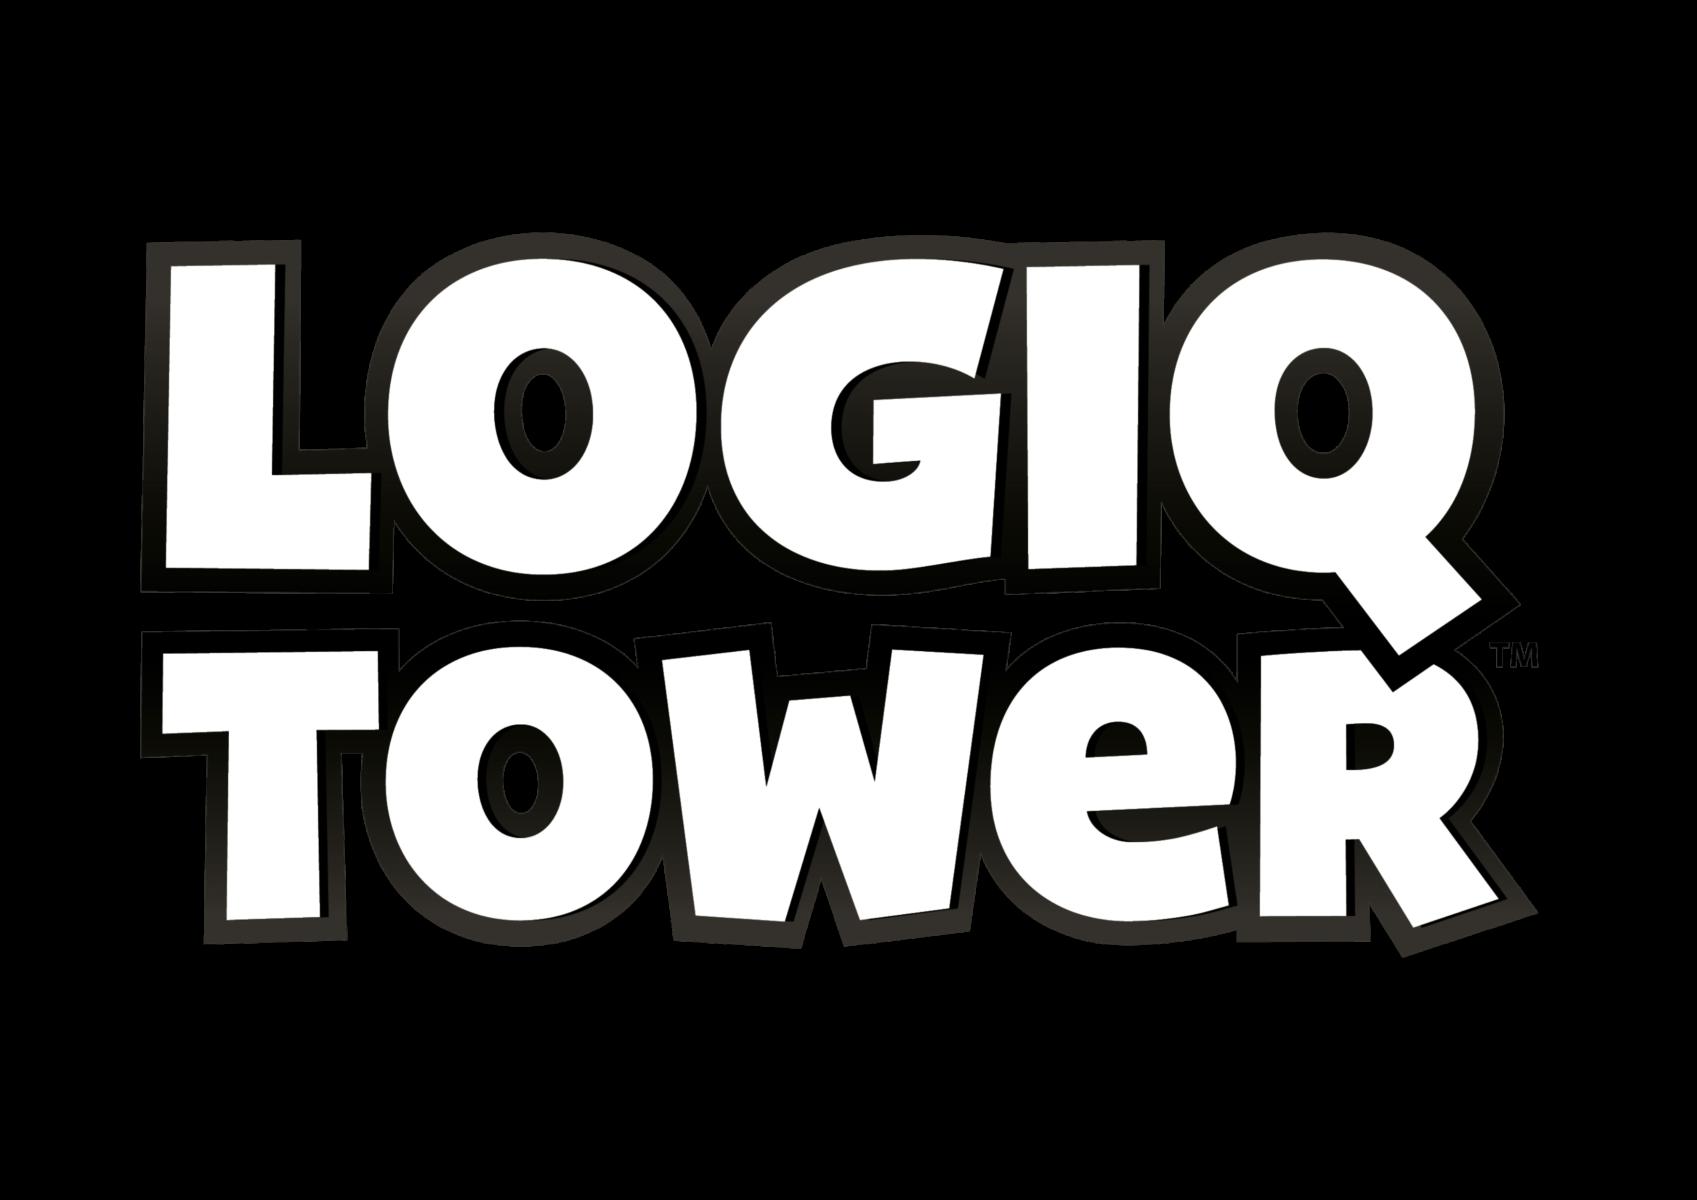 LOGIQ TOWER logo